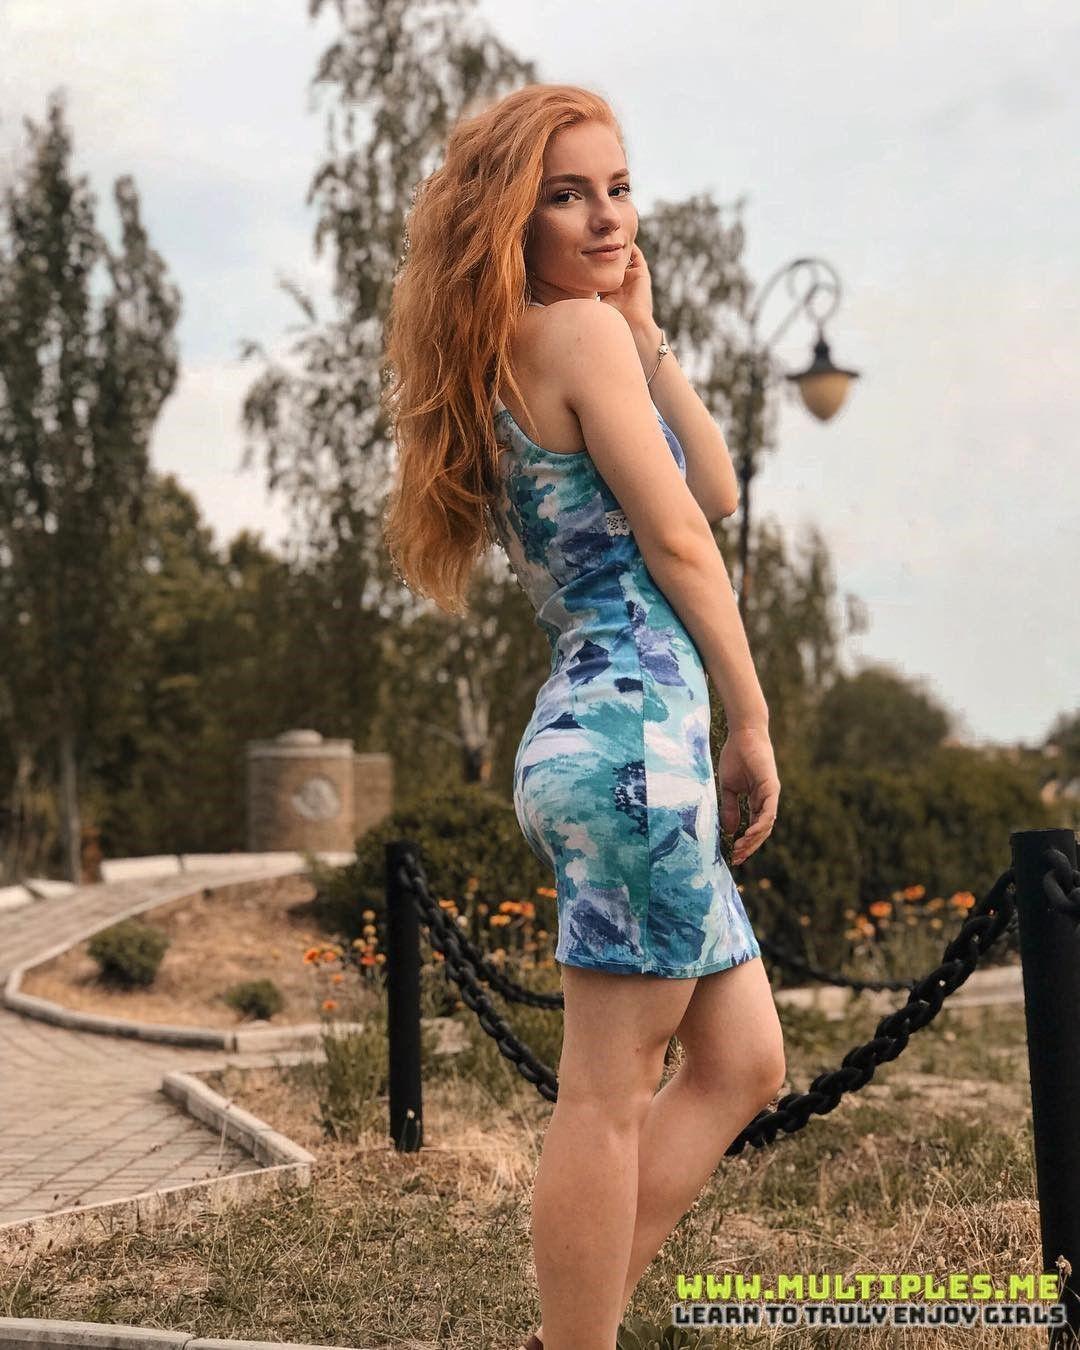 Pin de Daniela em Pēlirrojas | Cabelos ruivos, Meninas de